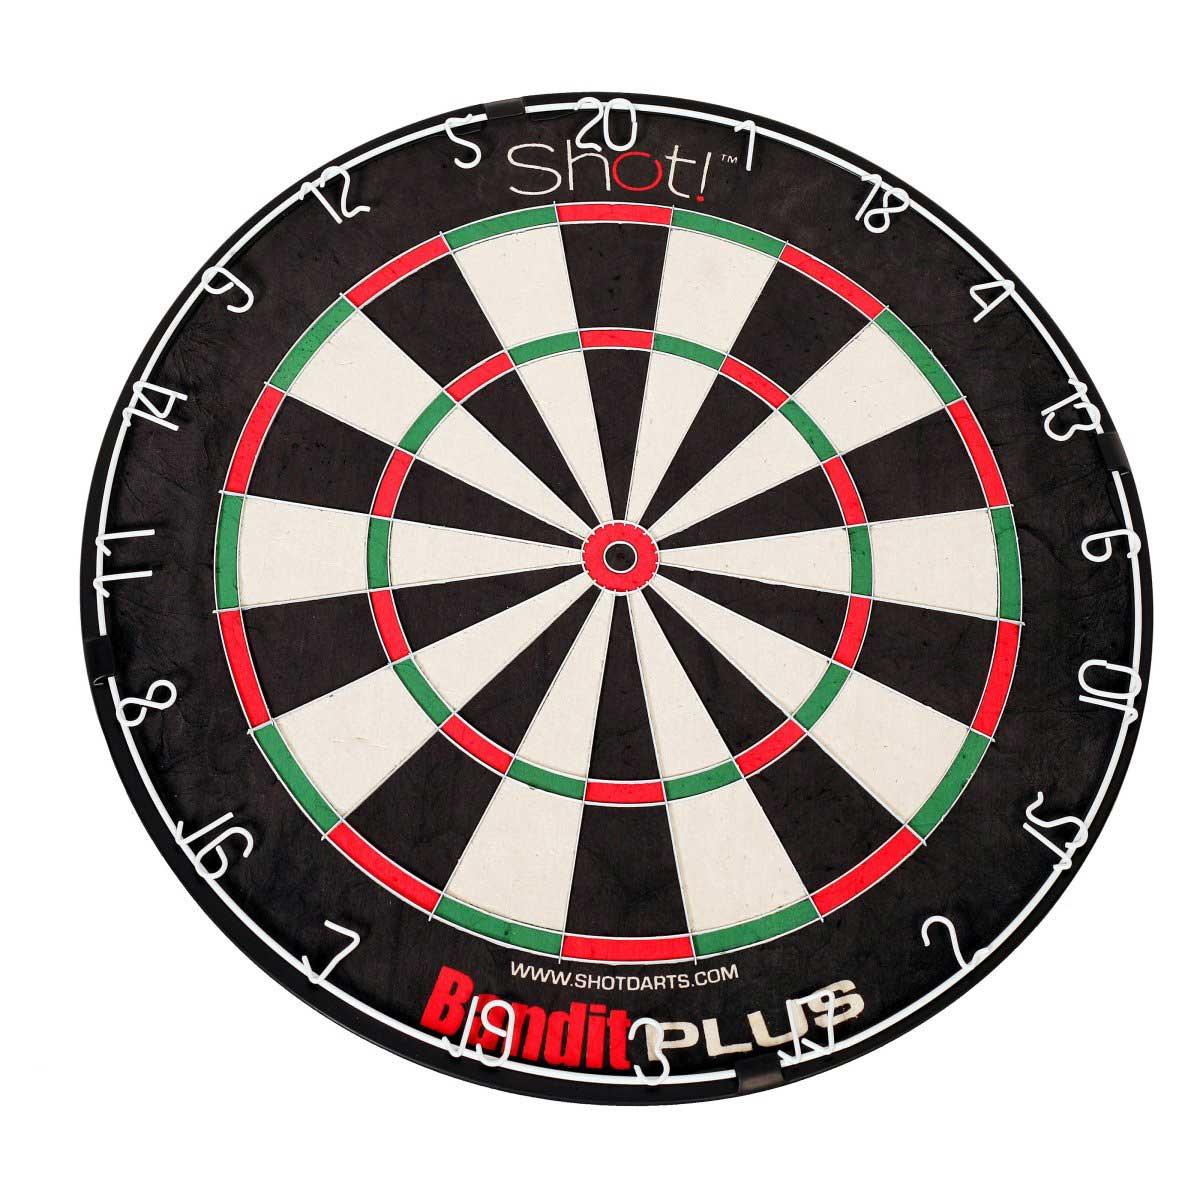 DMI Bandit Plus Staple-Freee Bristle Dart Board